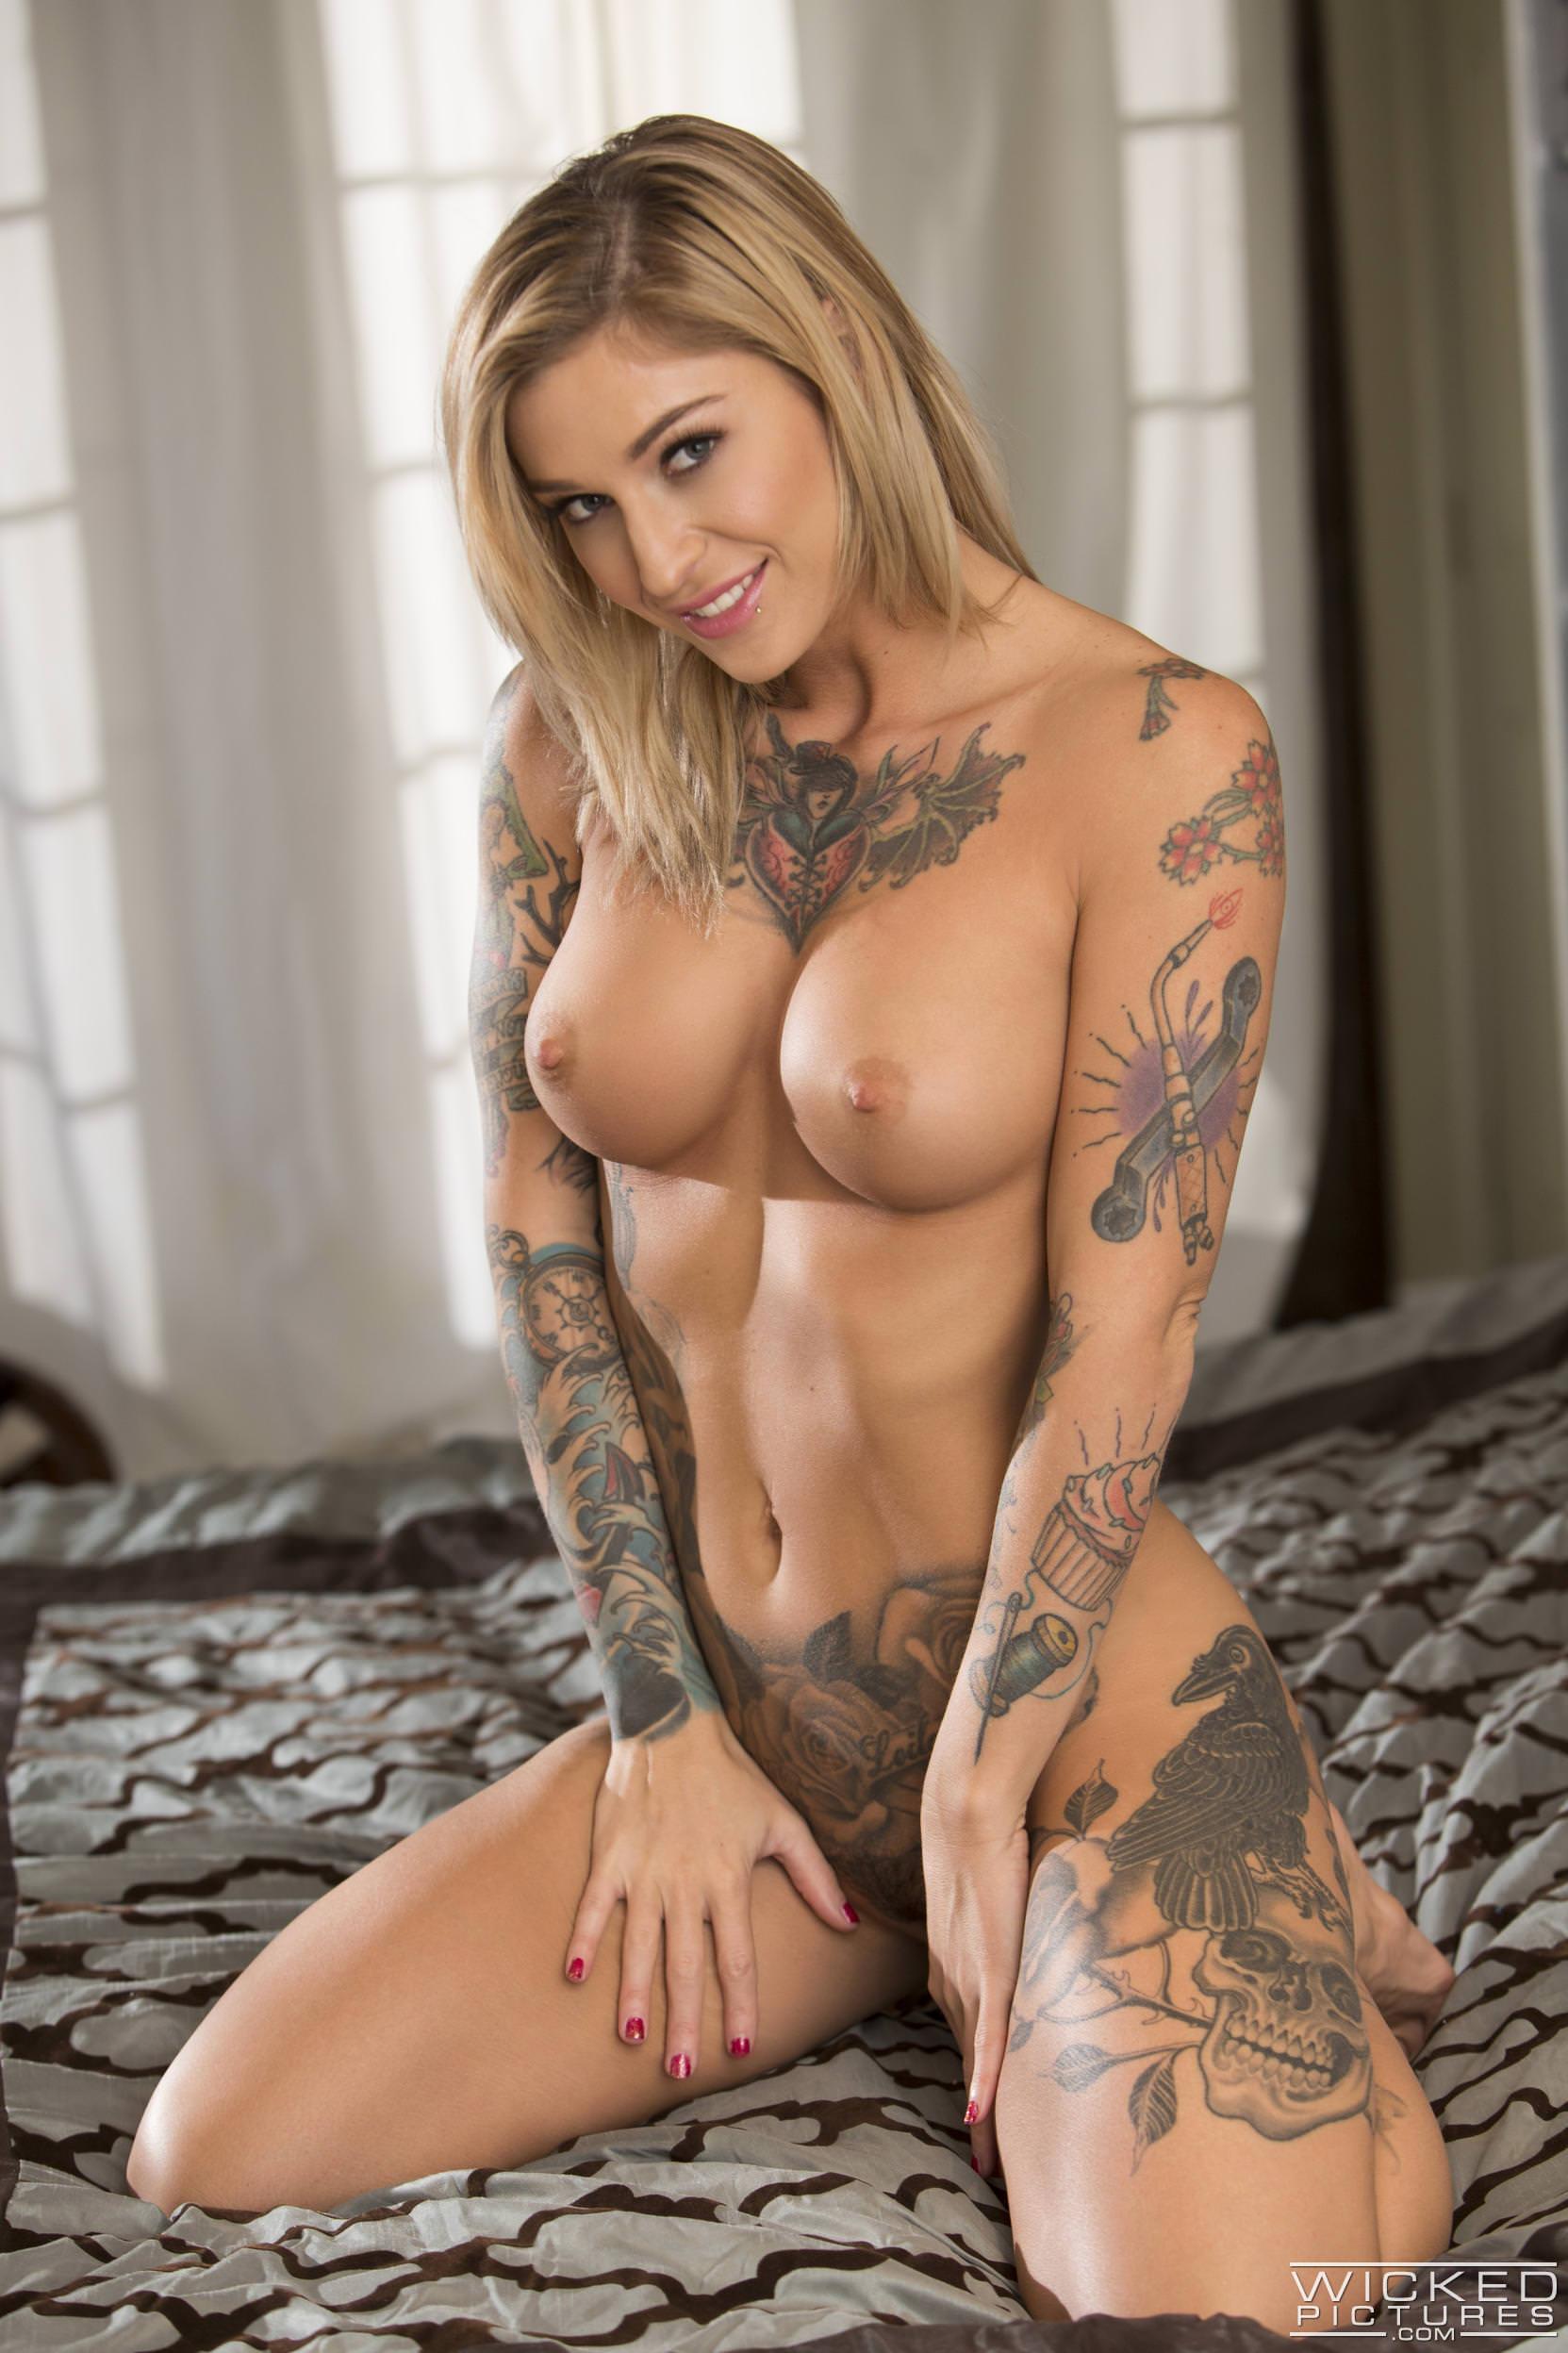 Hot milf franki ryder fucked on her desk porn image gallery scene